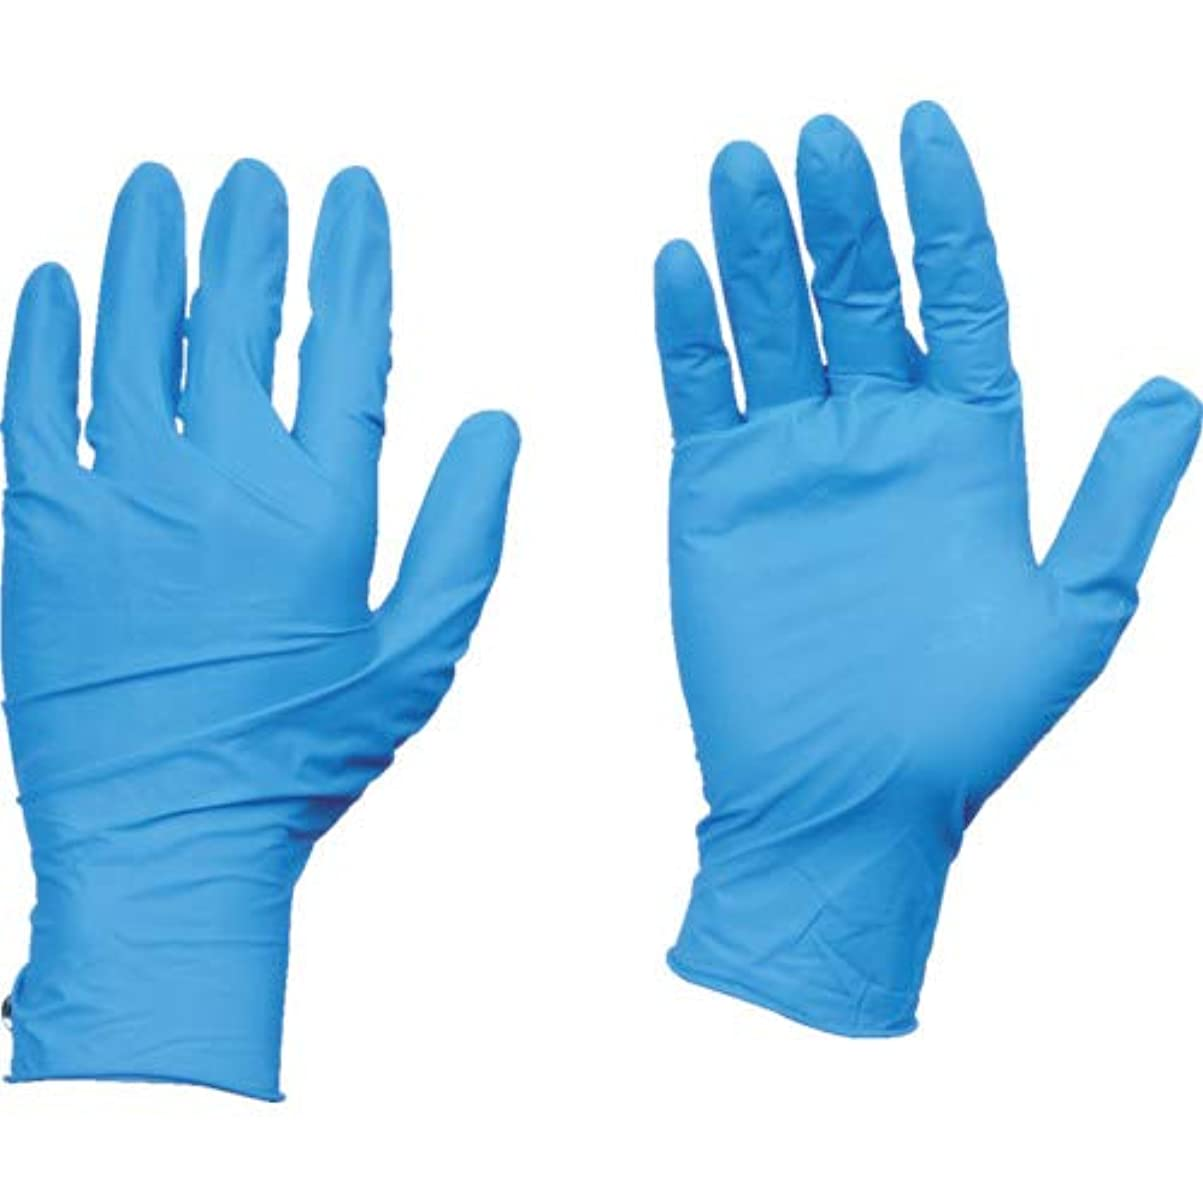 TRUSCO(トラスコ) 10箱入り 使い捨て天然ゴム手袋TGワーク 0.10 粉付青M TGPL10BM10C